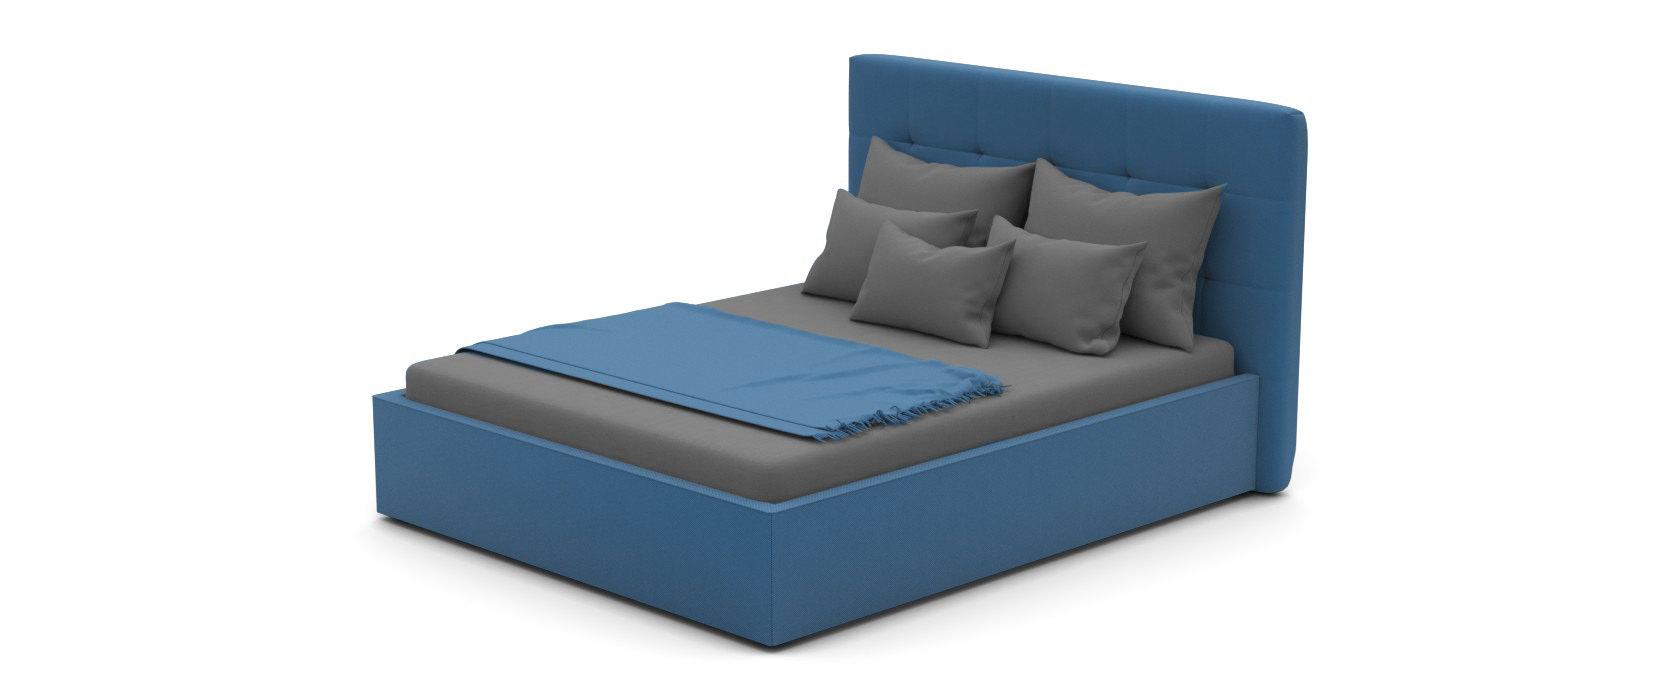 Кровать Dimaro - Pufetto